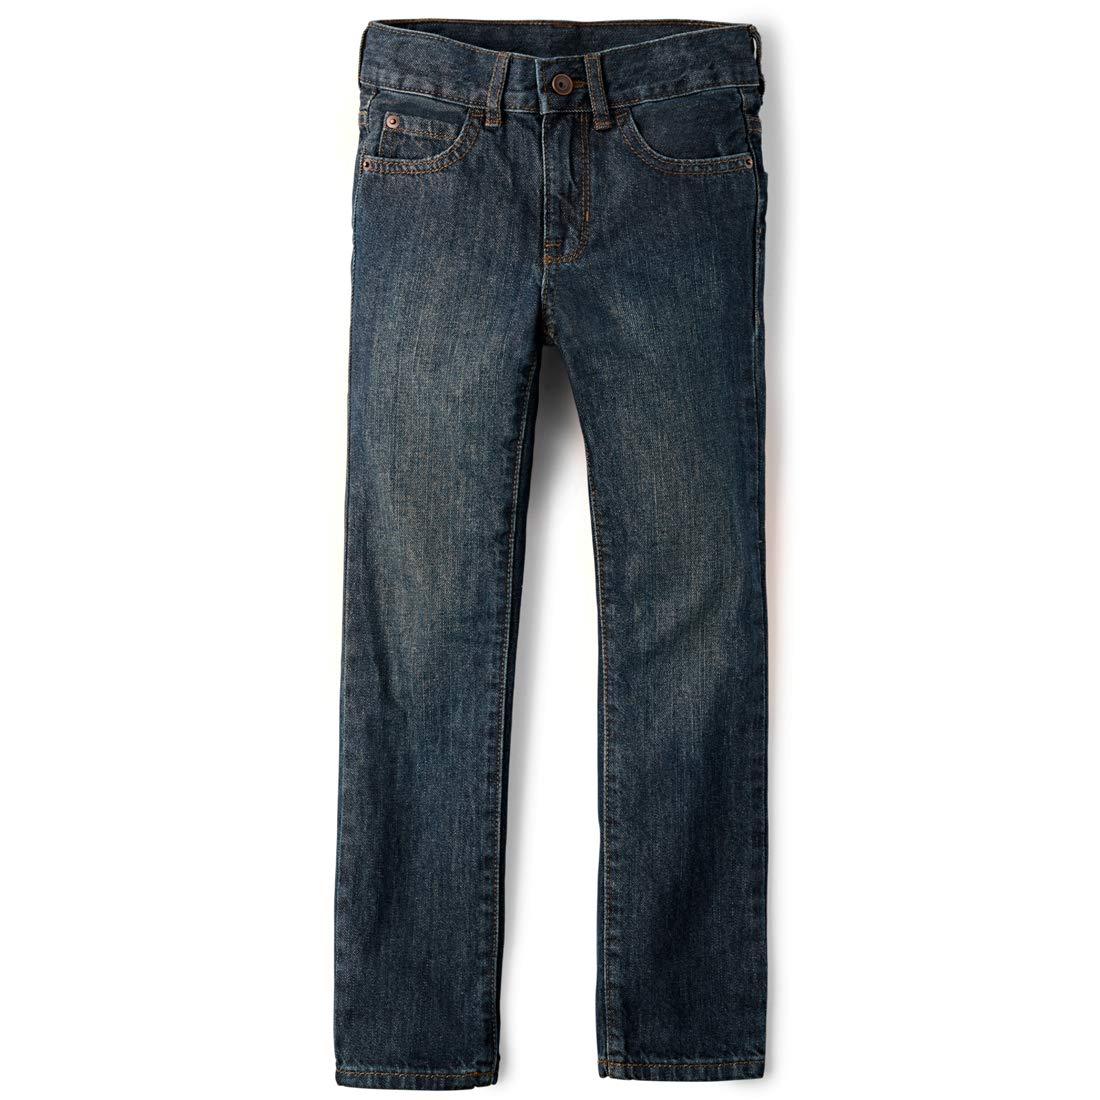 The Children's Place Big Boys' Straight Leg Jeans, Dry Indigo,8